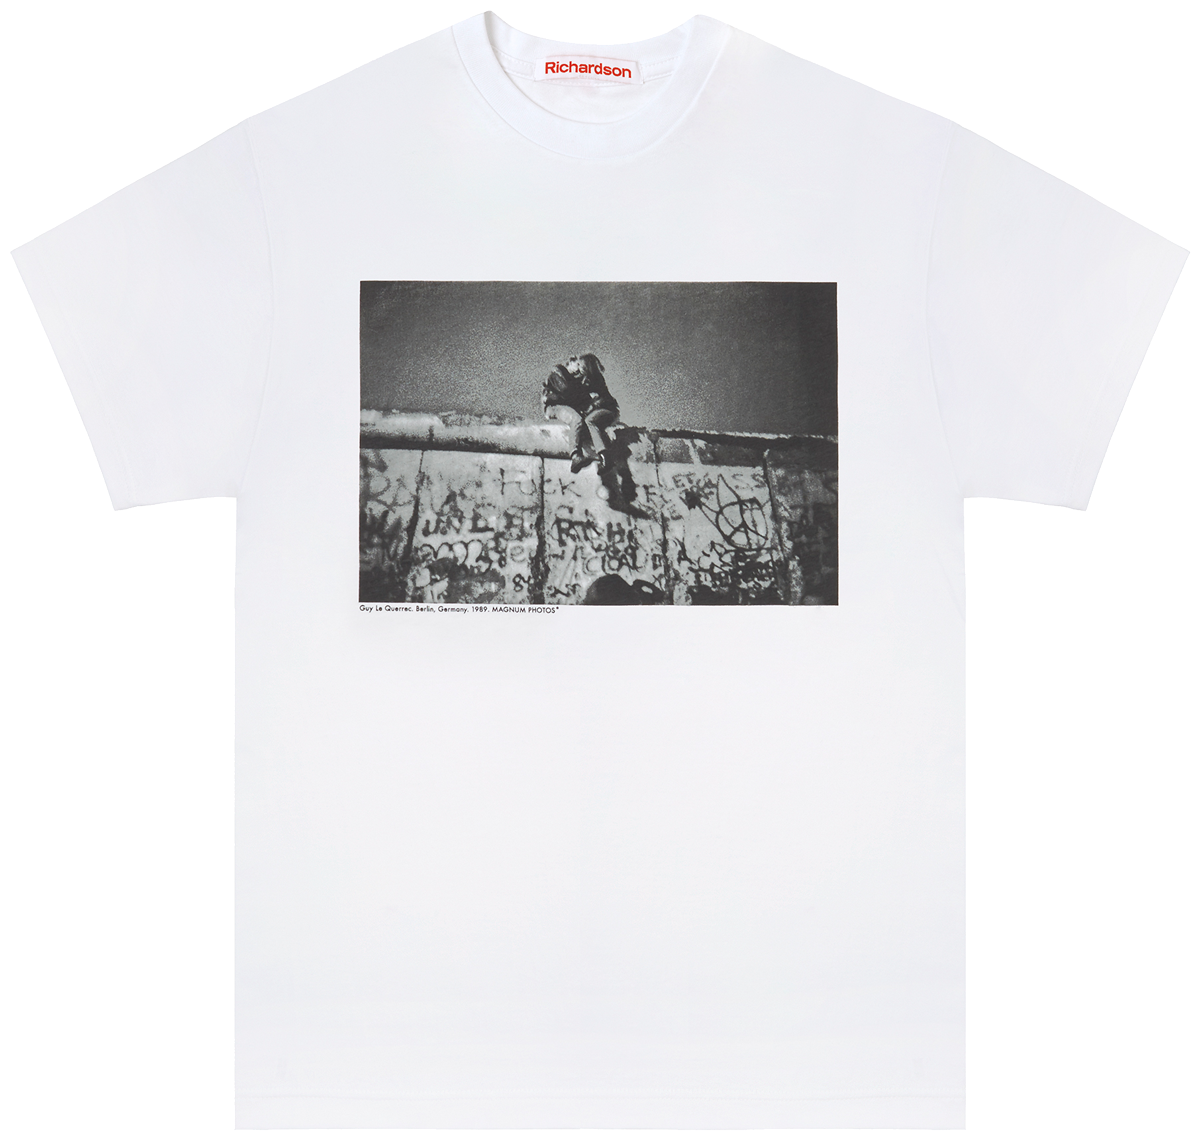 DSM GINZA:Magnum Photos x Richardson x DSM Capsule T-Shirts collection